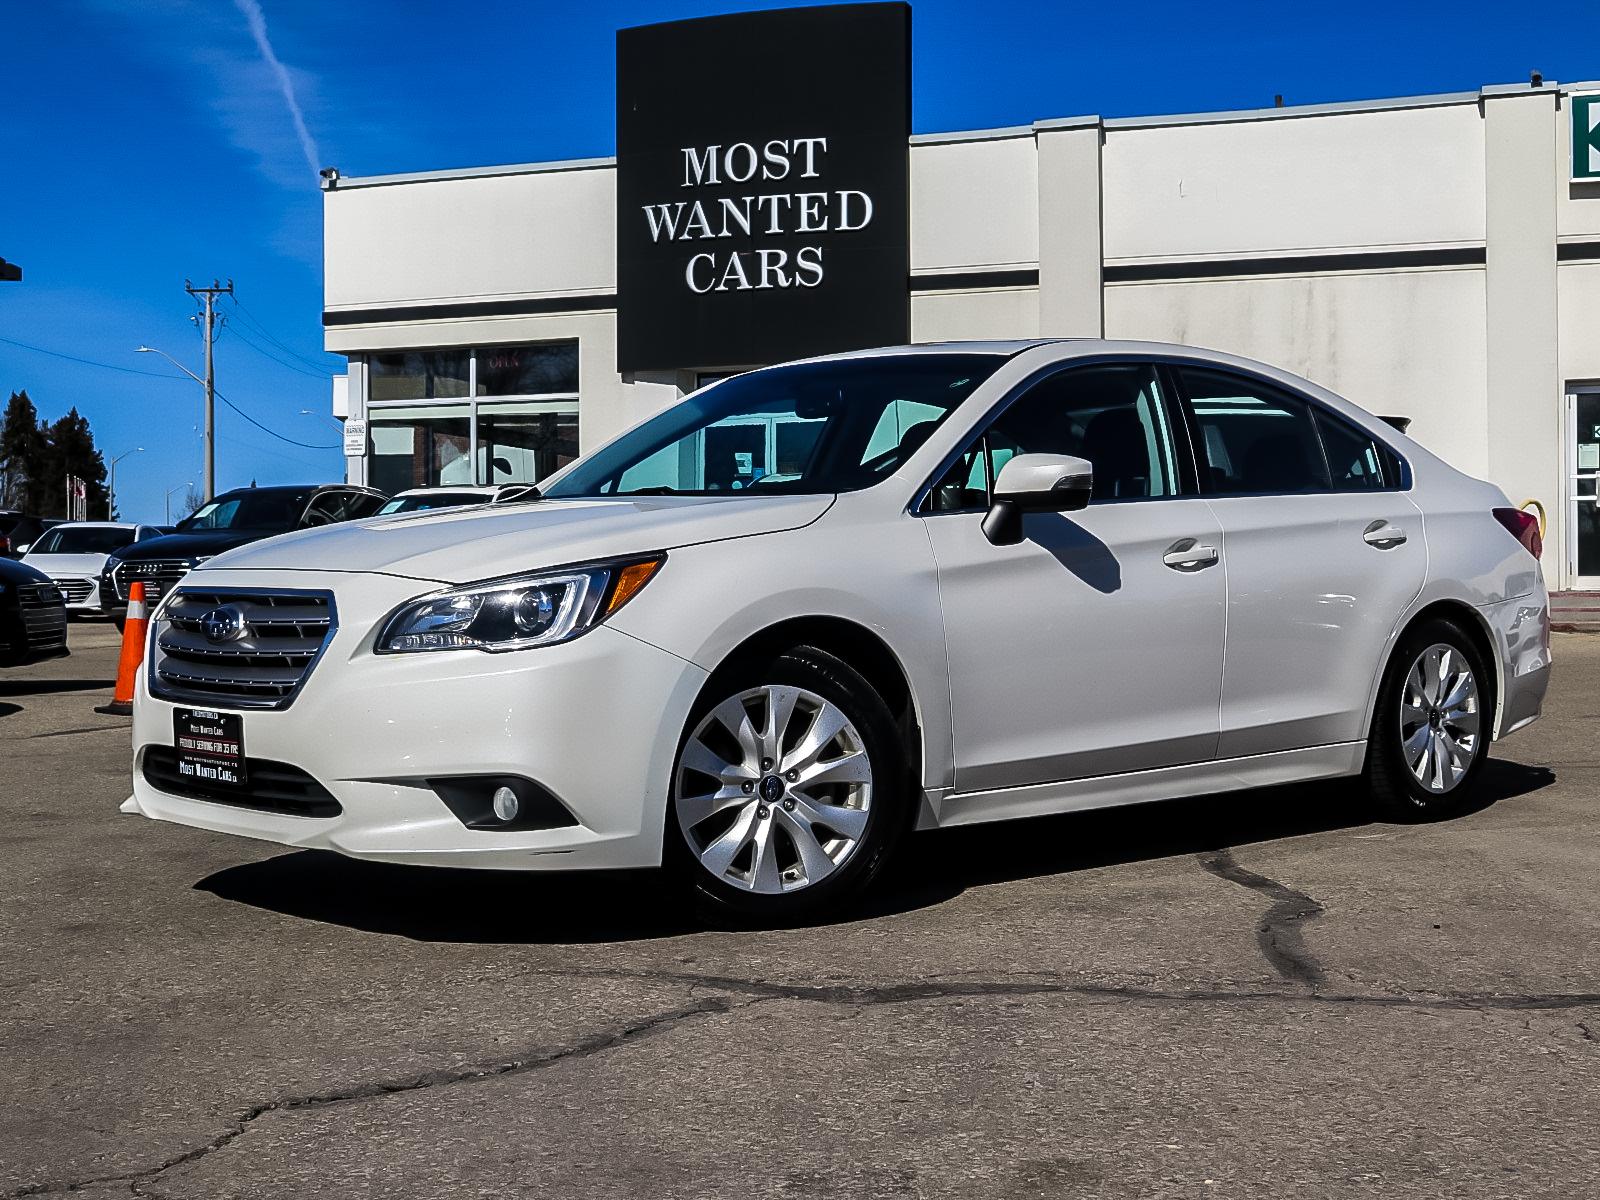 used 2017 Subaru Legacy car, priced at $15,982